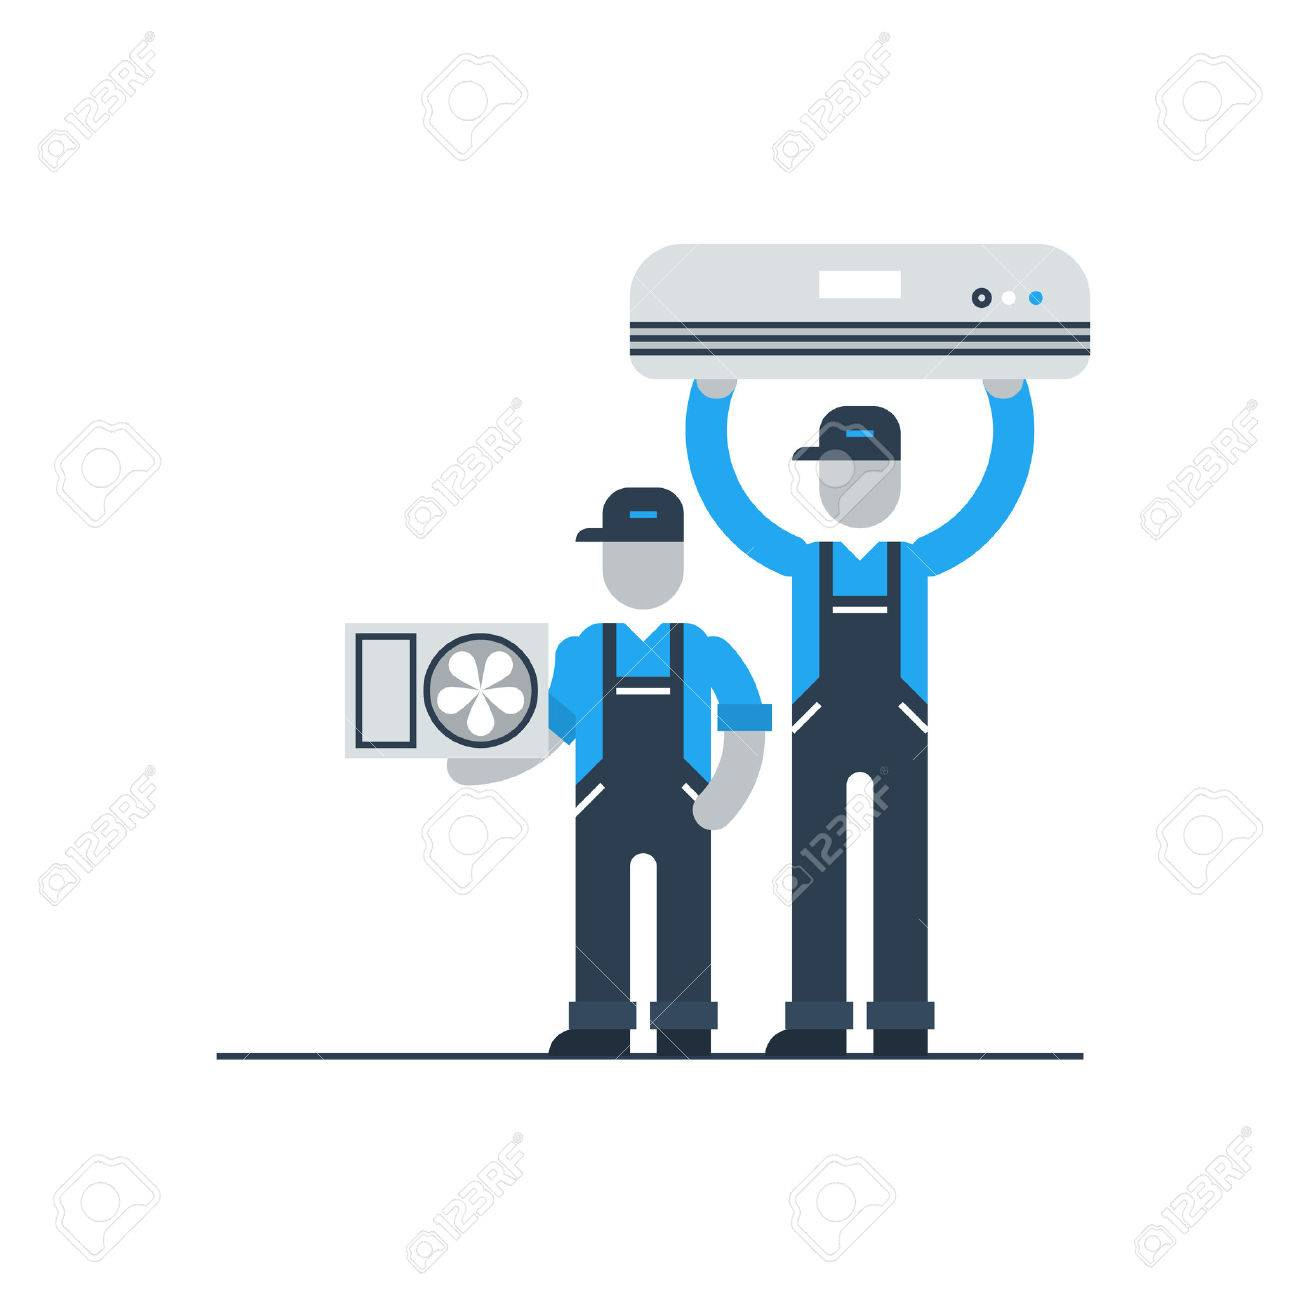 Air conditioner service - 53250663